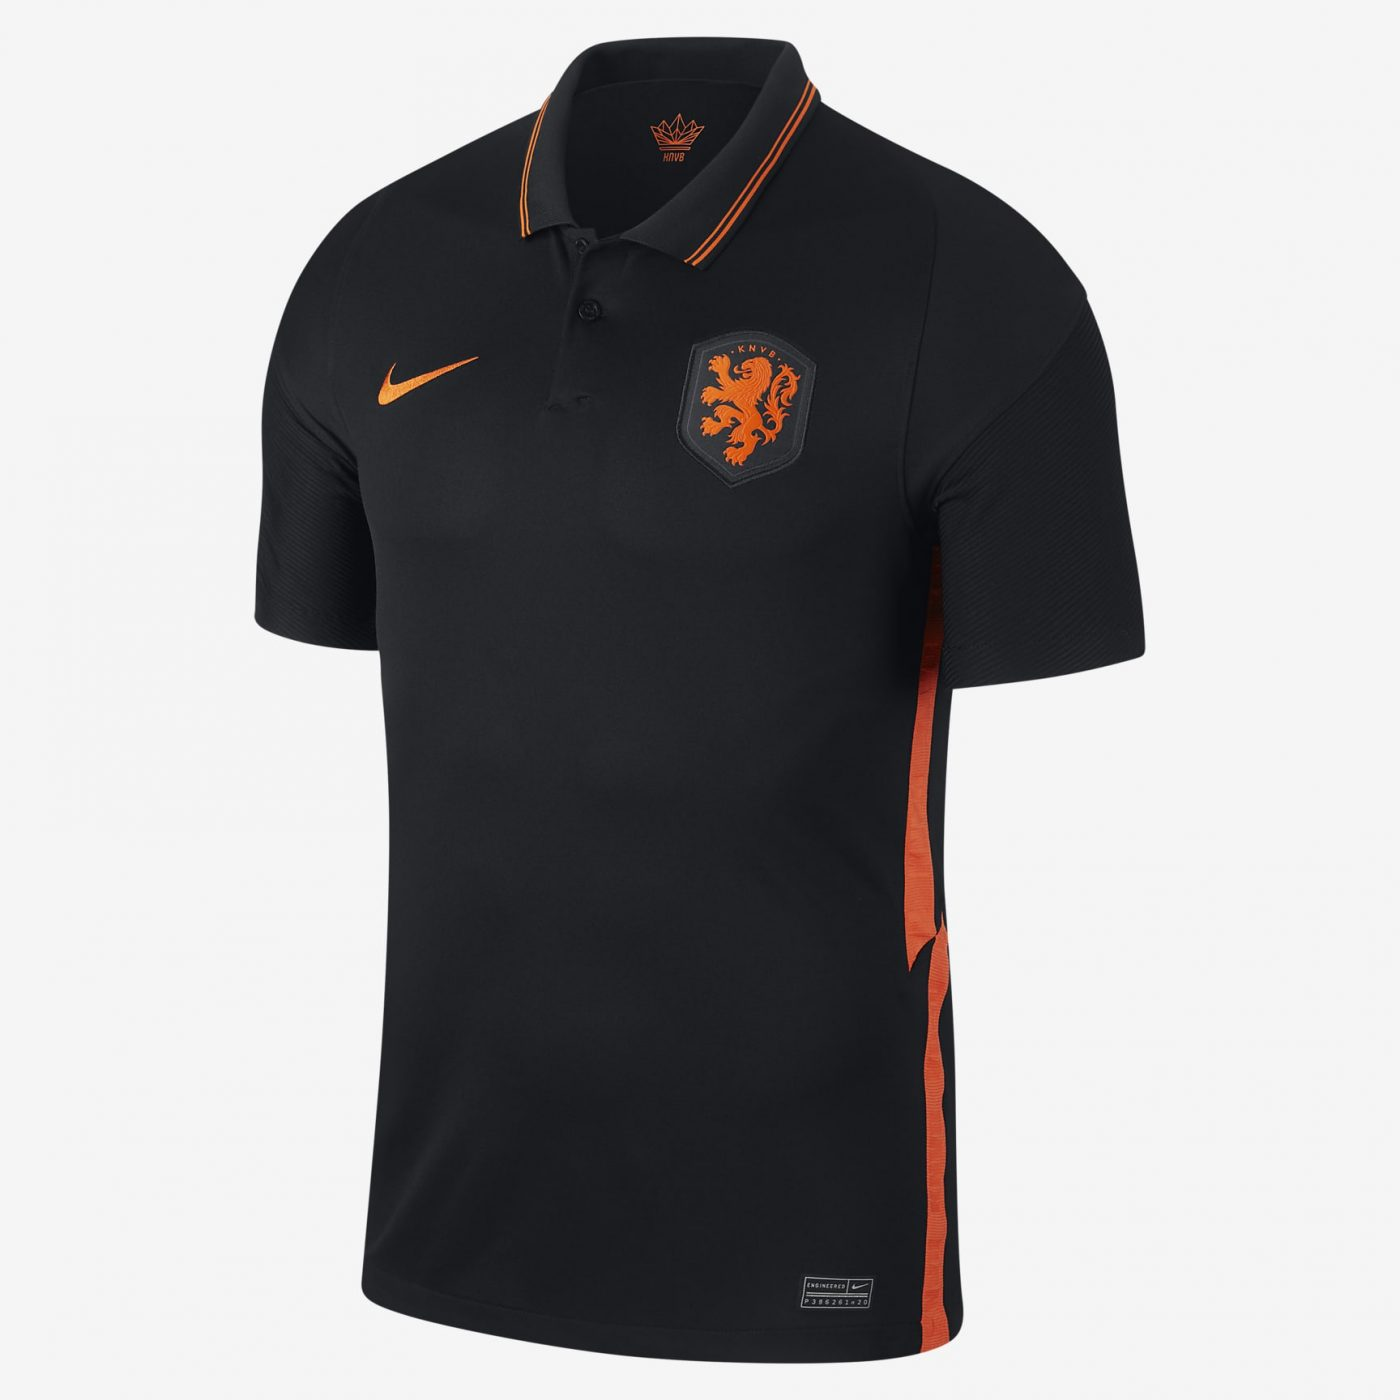 maillot-exterieur-pays-bas-2020-2022-nike